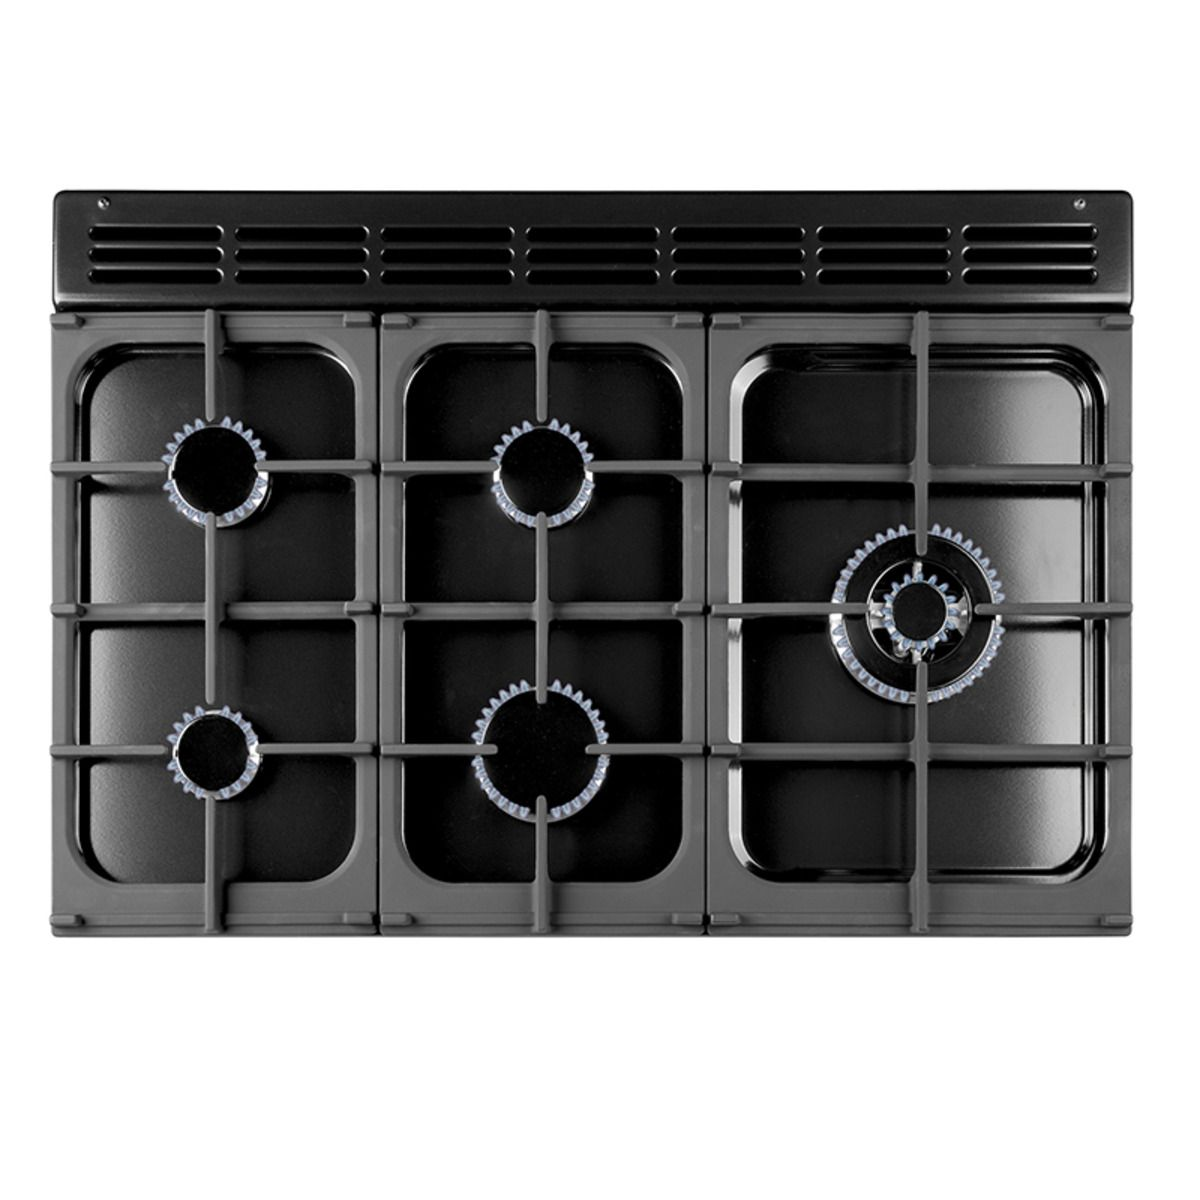 Buy Used Appliances Kitchener | Kitchen Appliances